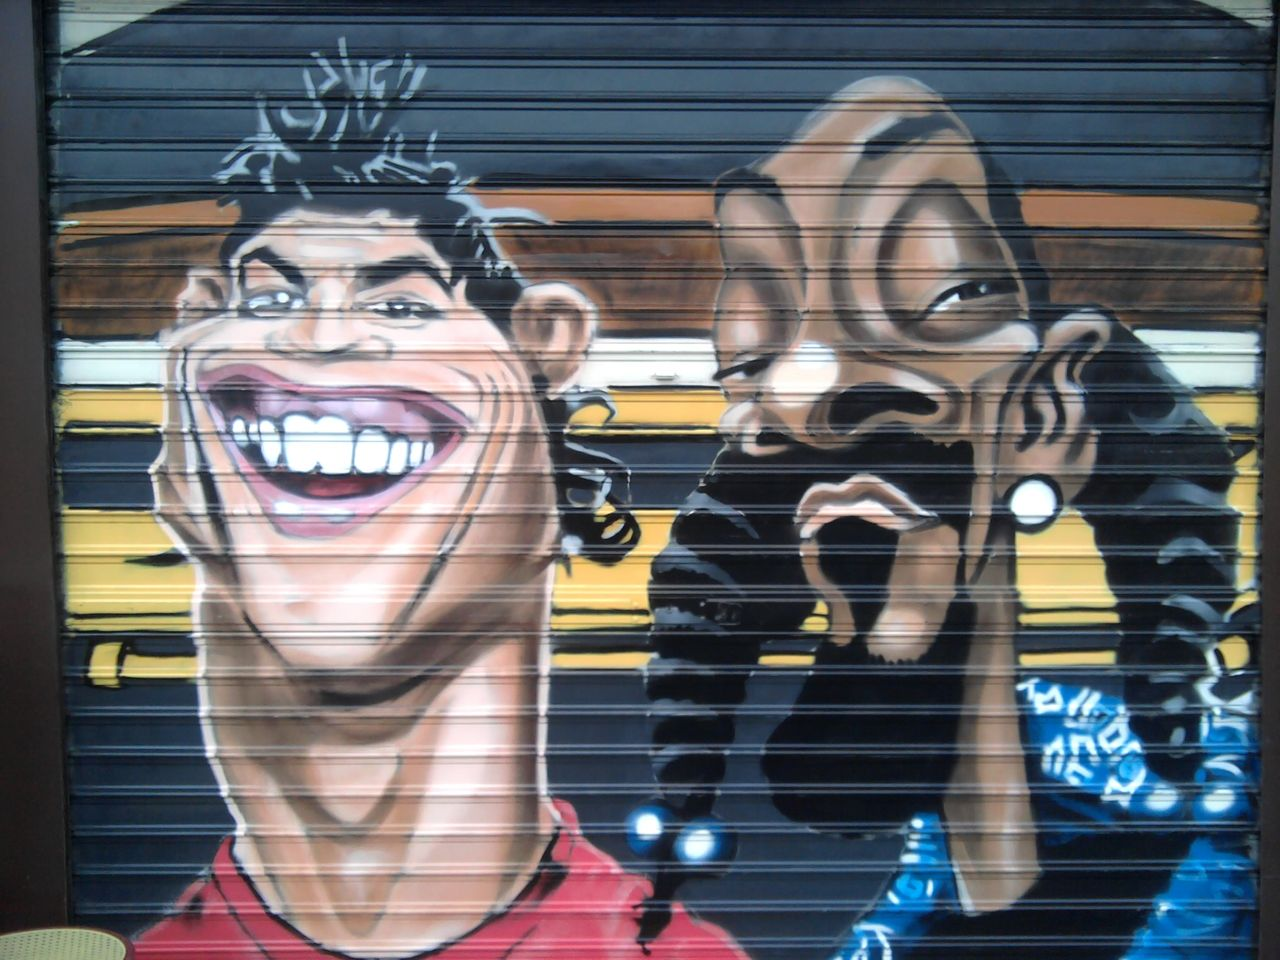 stiankr oner Ronaldo/Snoop